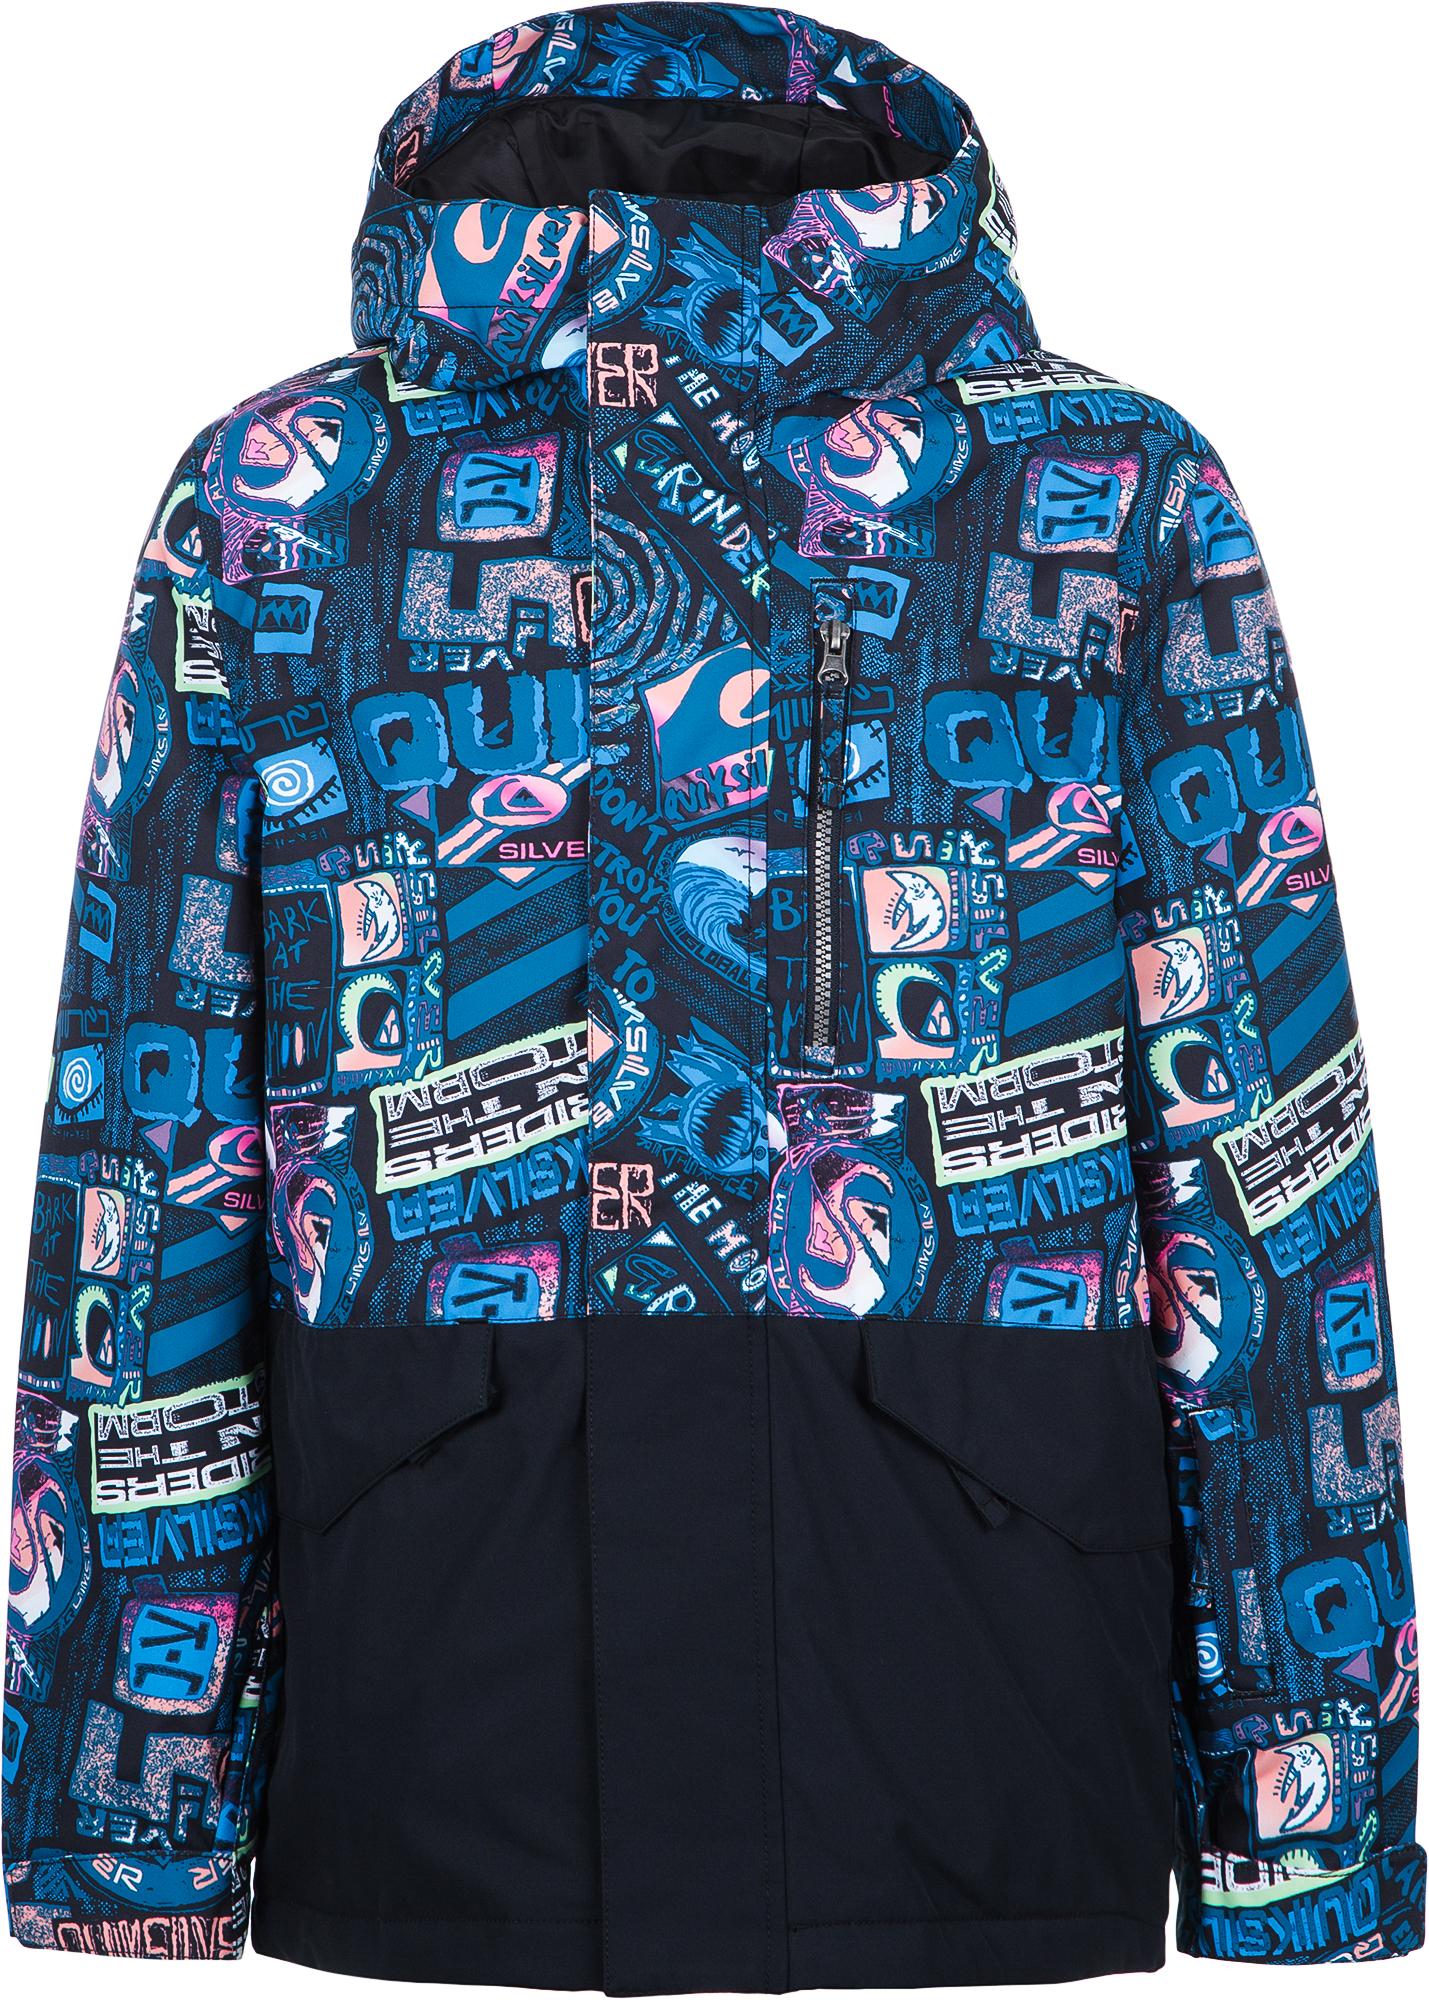 Quiksilver Куртка утепленная для мальчиков Mission Block Youth, размер 164-170